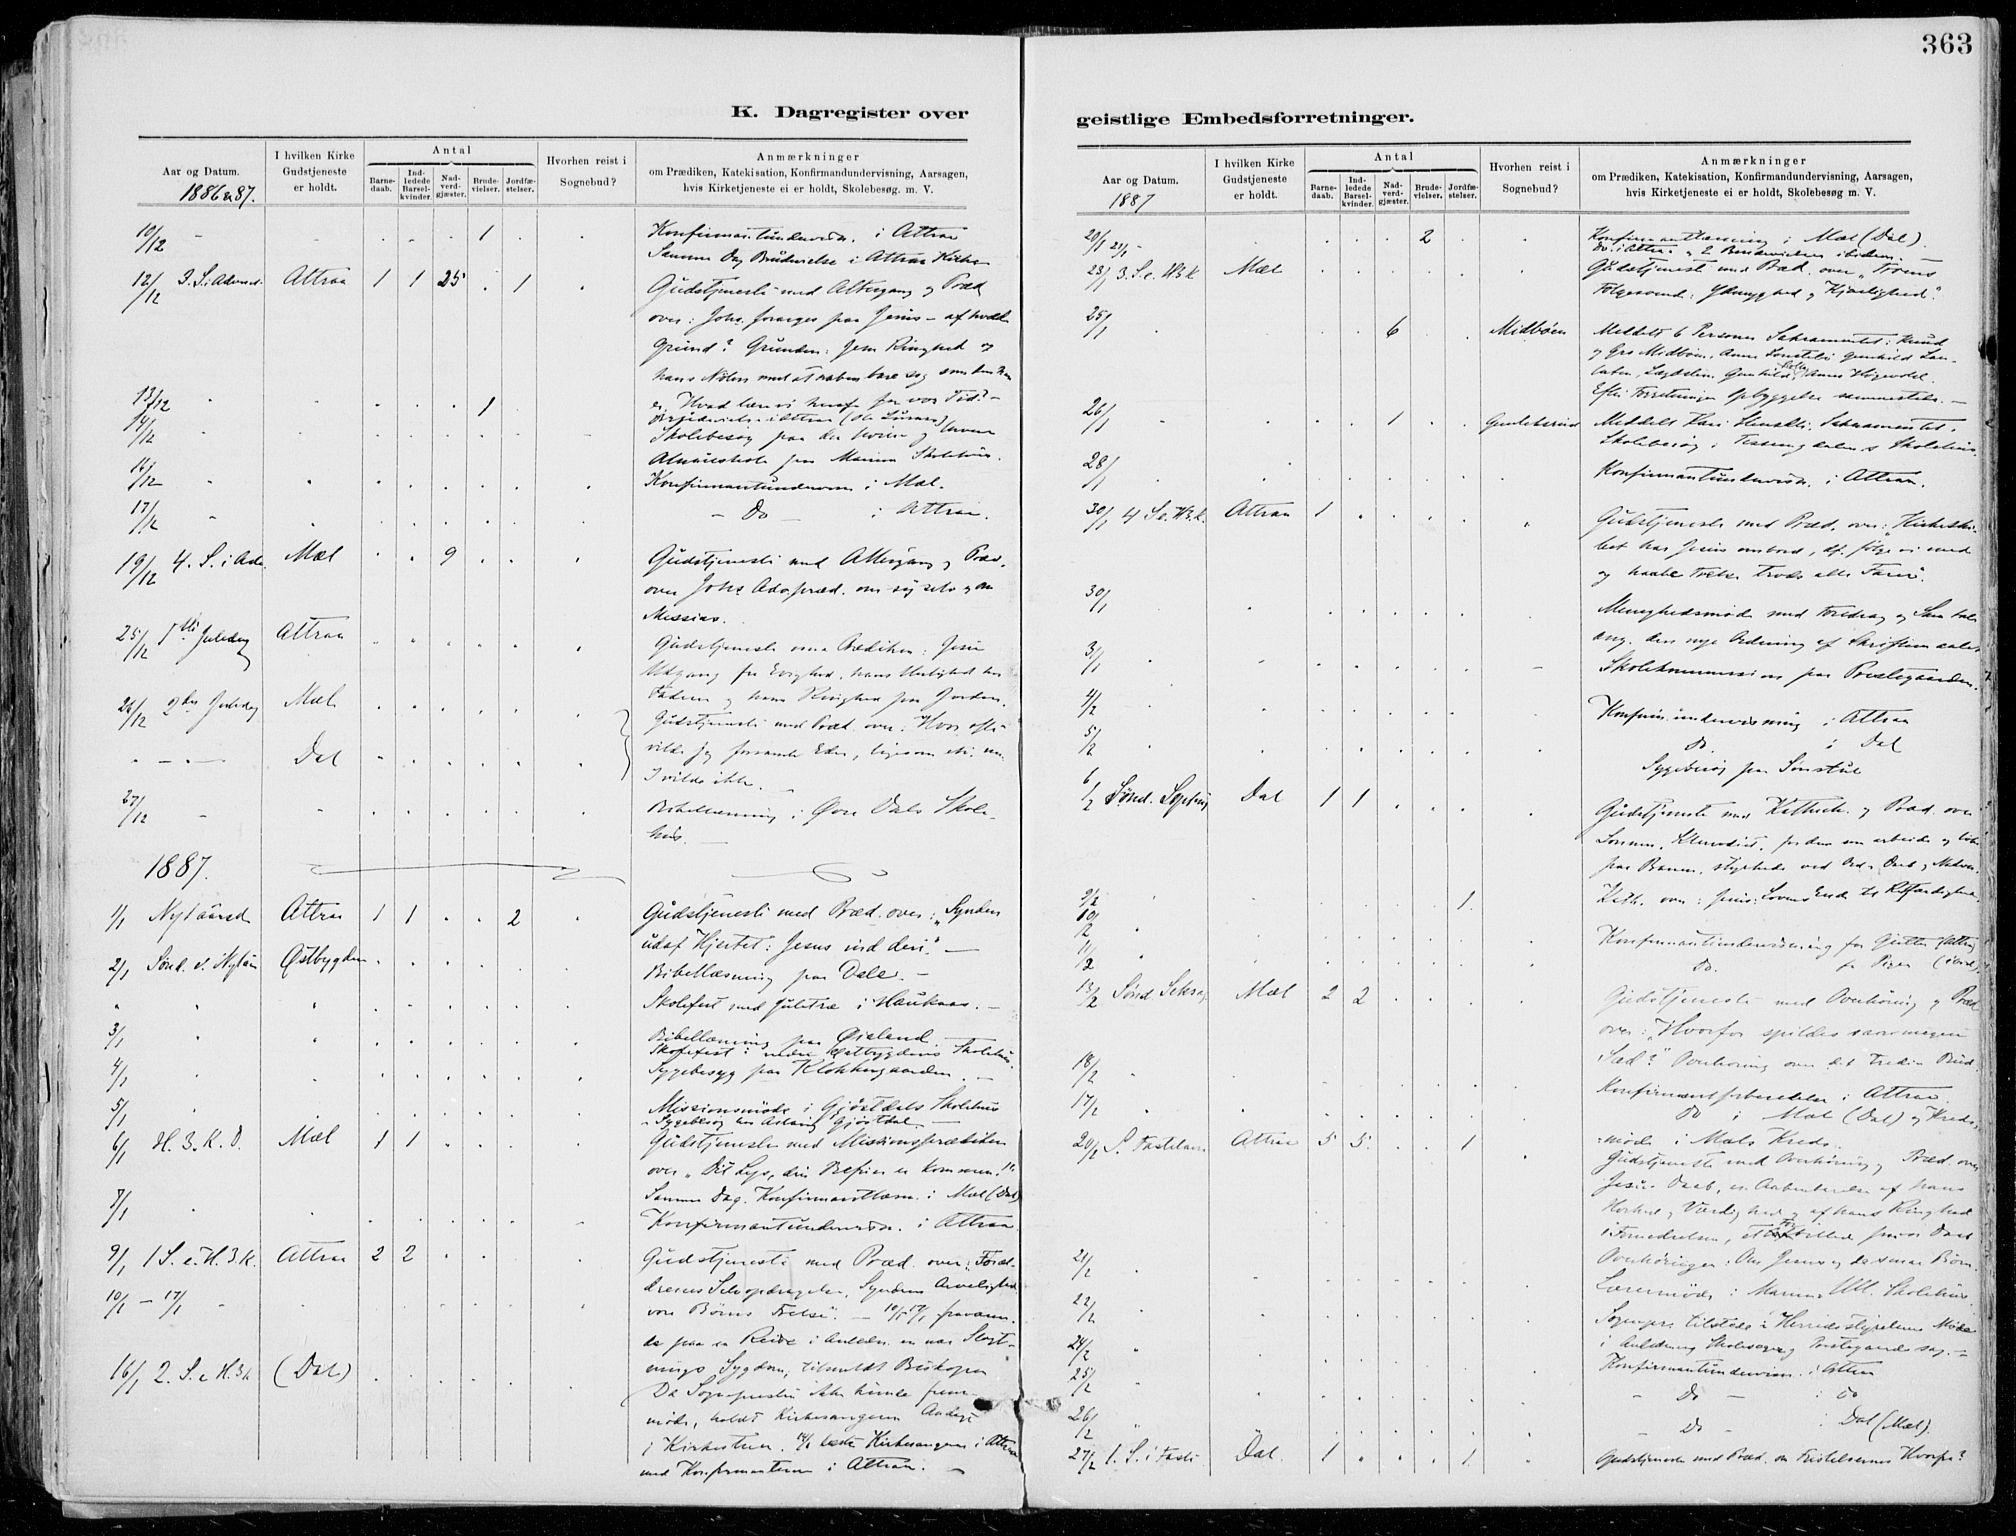 SAKO, Tinn kirkebøker, F/Fa/L0007: Ministerialbok nr. I 7, 1878-1922, s. 363